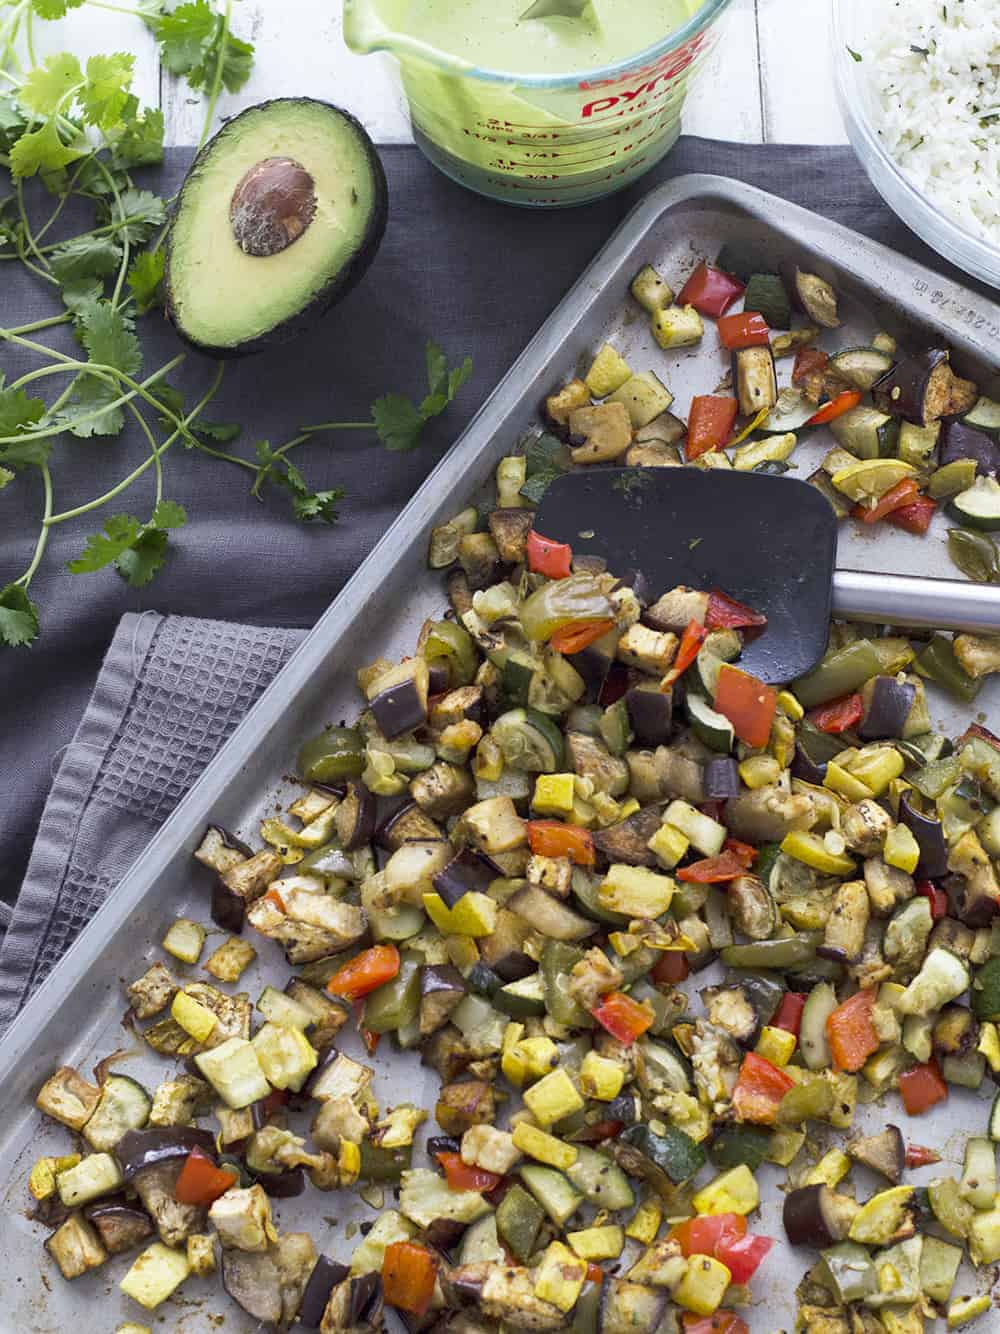 Vegetable Fajita Bowls with Creamy Cilantro Sauce! Roasted summer vegetables, cilantro rice, avocado and a creamy, dairy-free cilantro sauce. Vegan and Glutenfree | www.delishknowledge.com